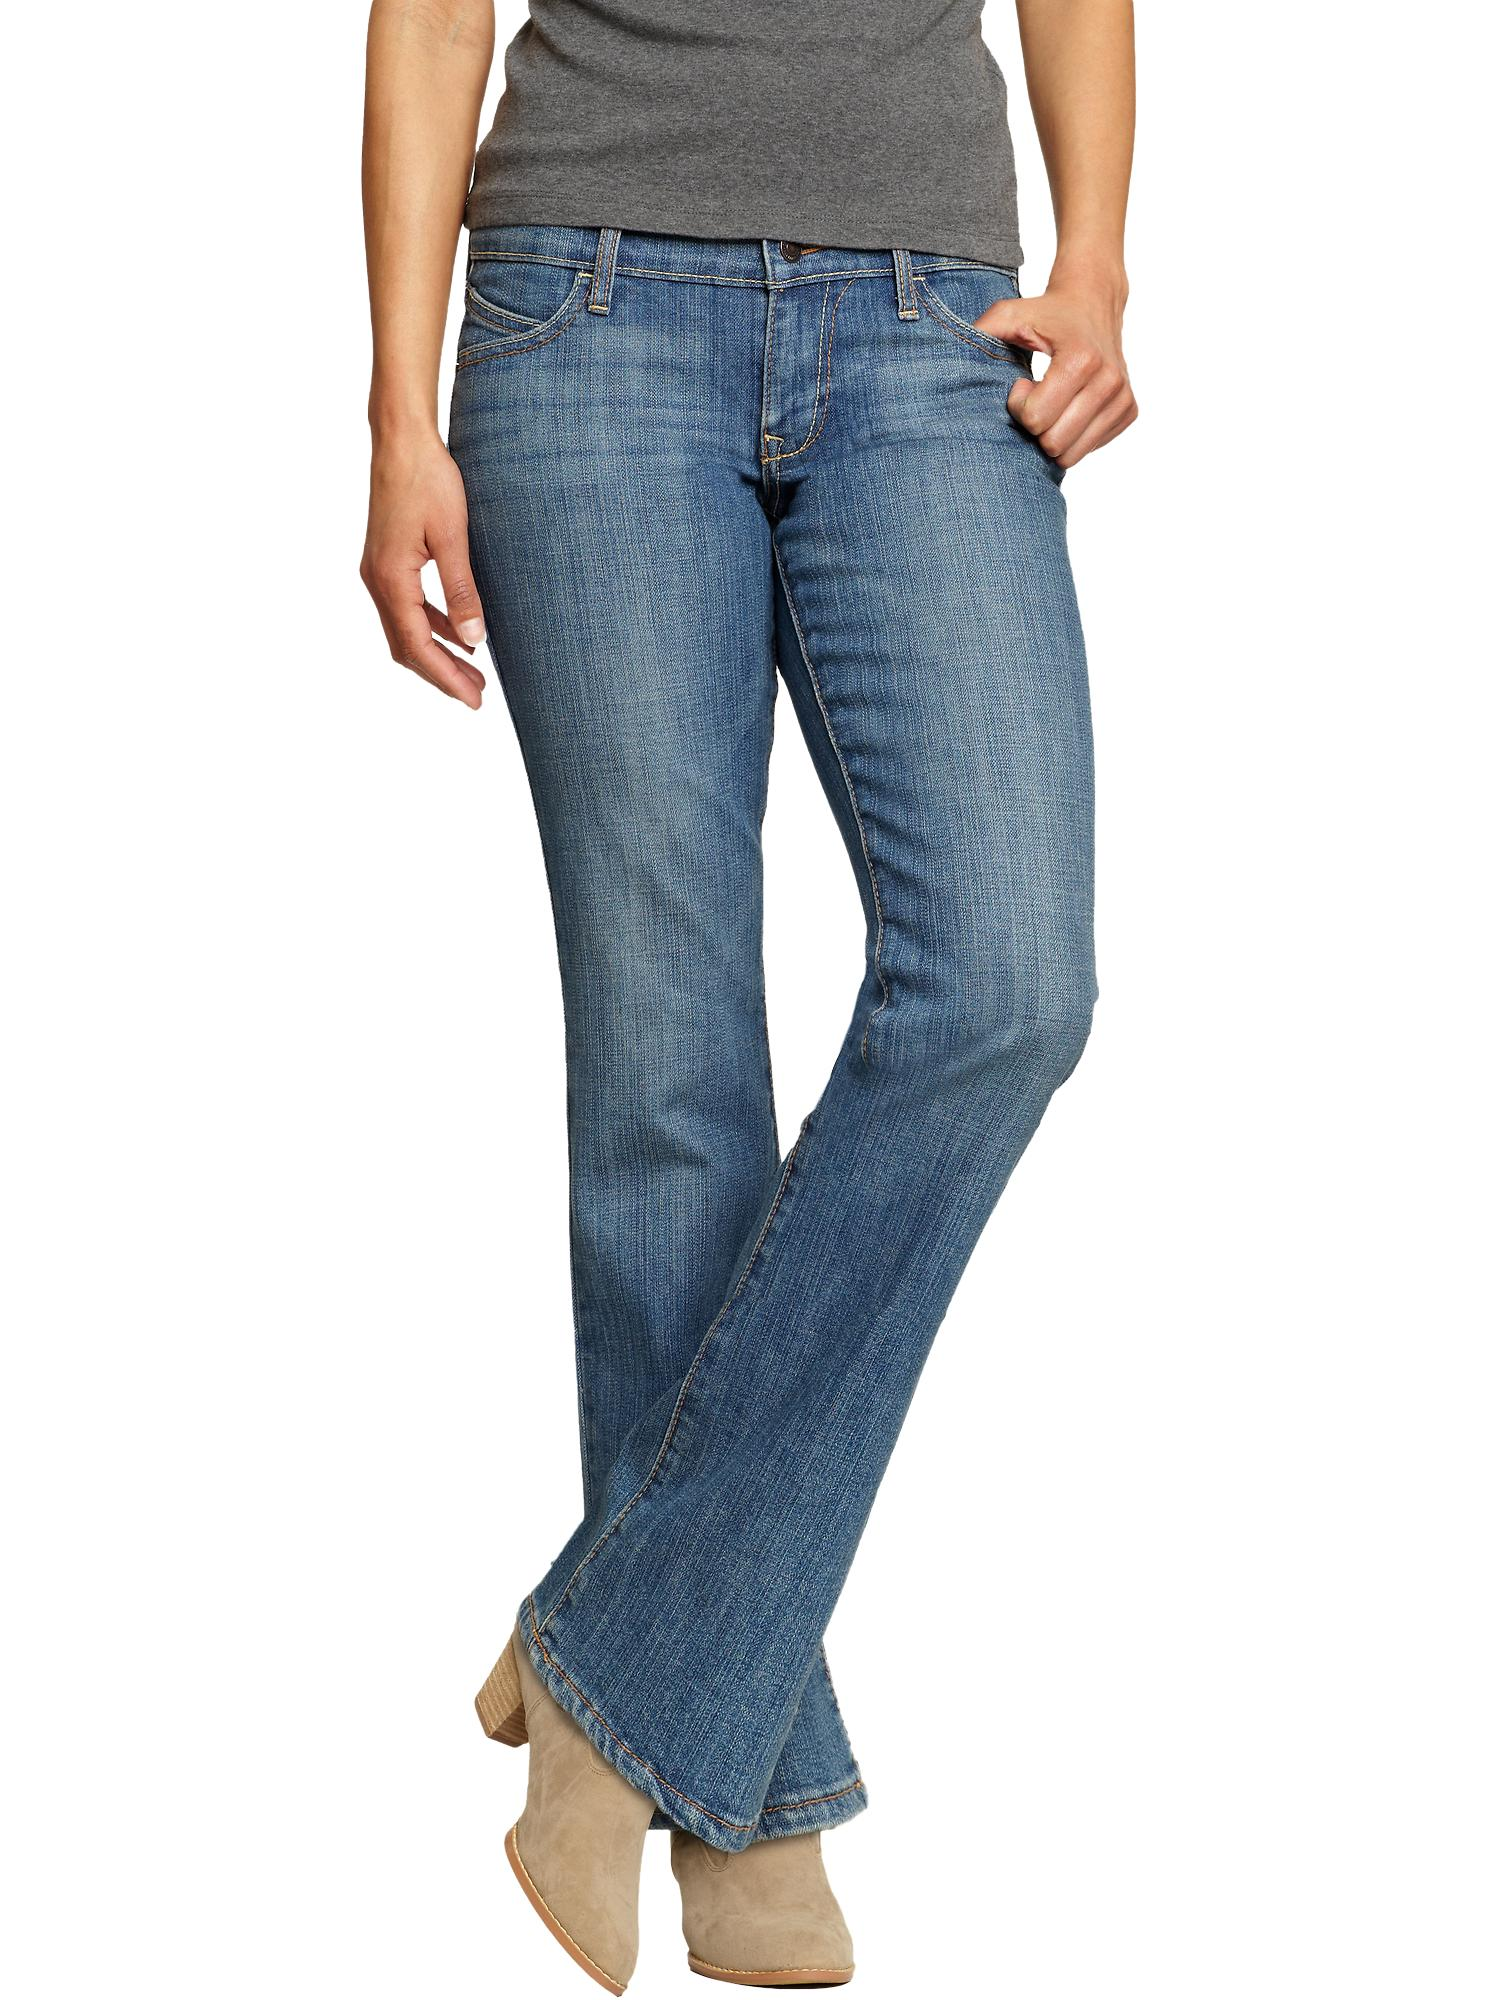 ff770caa2f3 Original Boot-Cut Jeans for Women